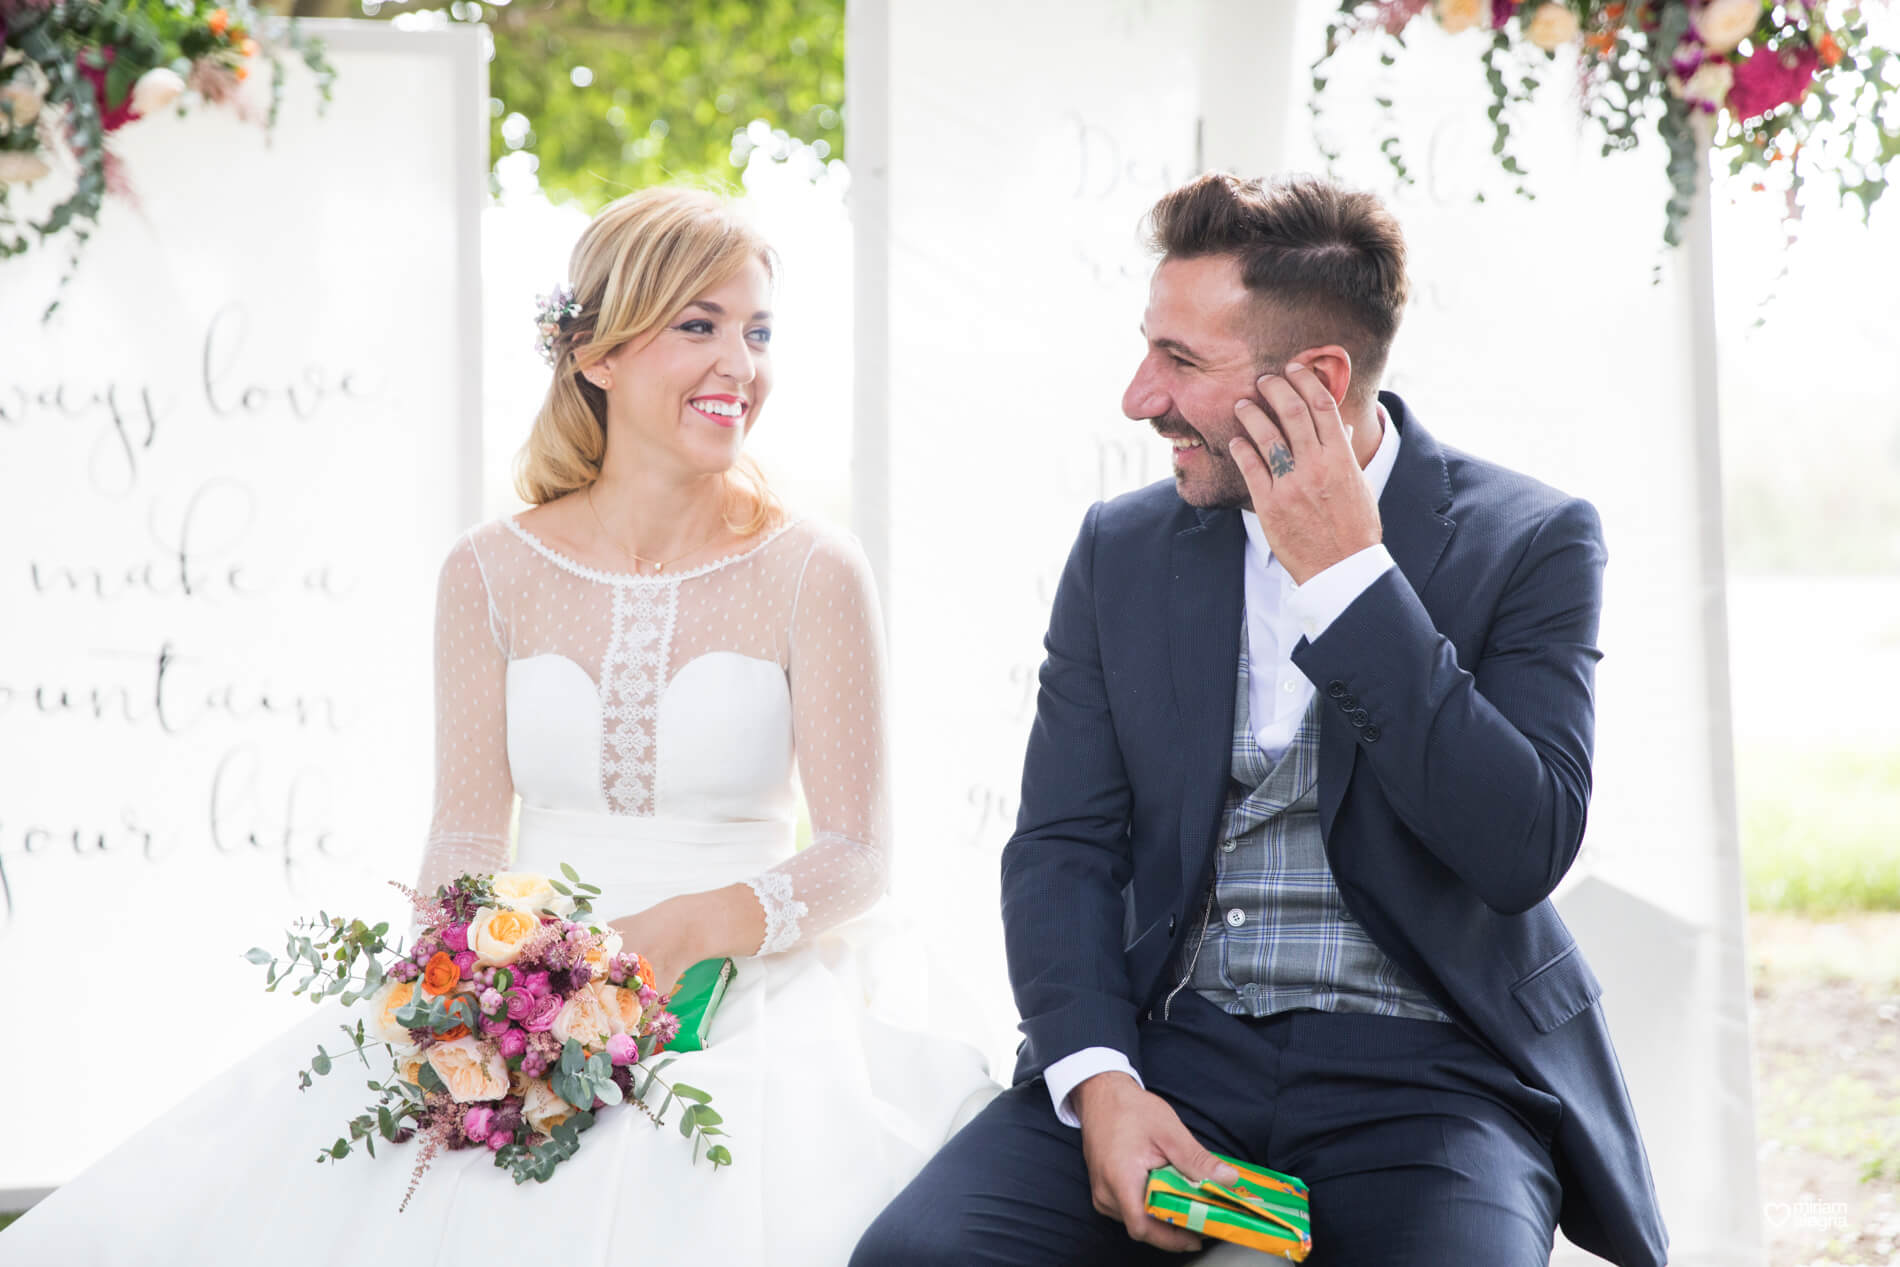 la-boda-de-alemc7-miriam-alegria-fotografos-boda-murcia-53